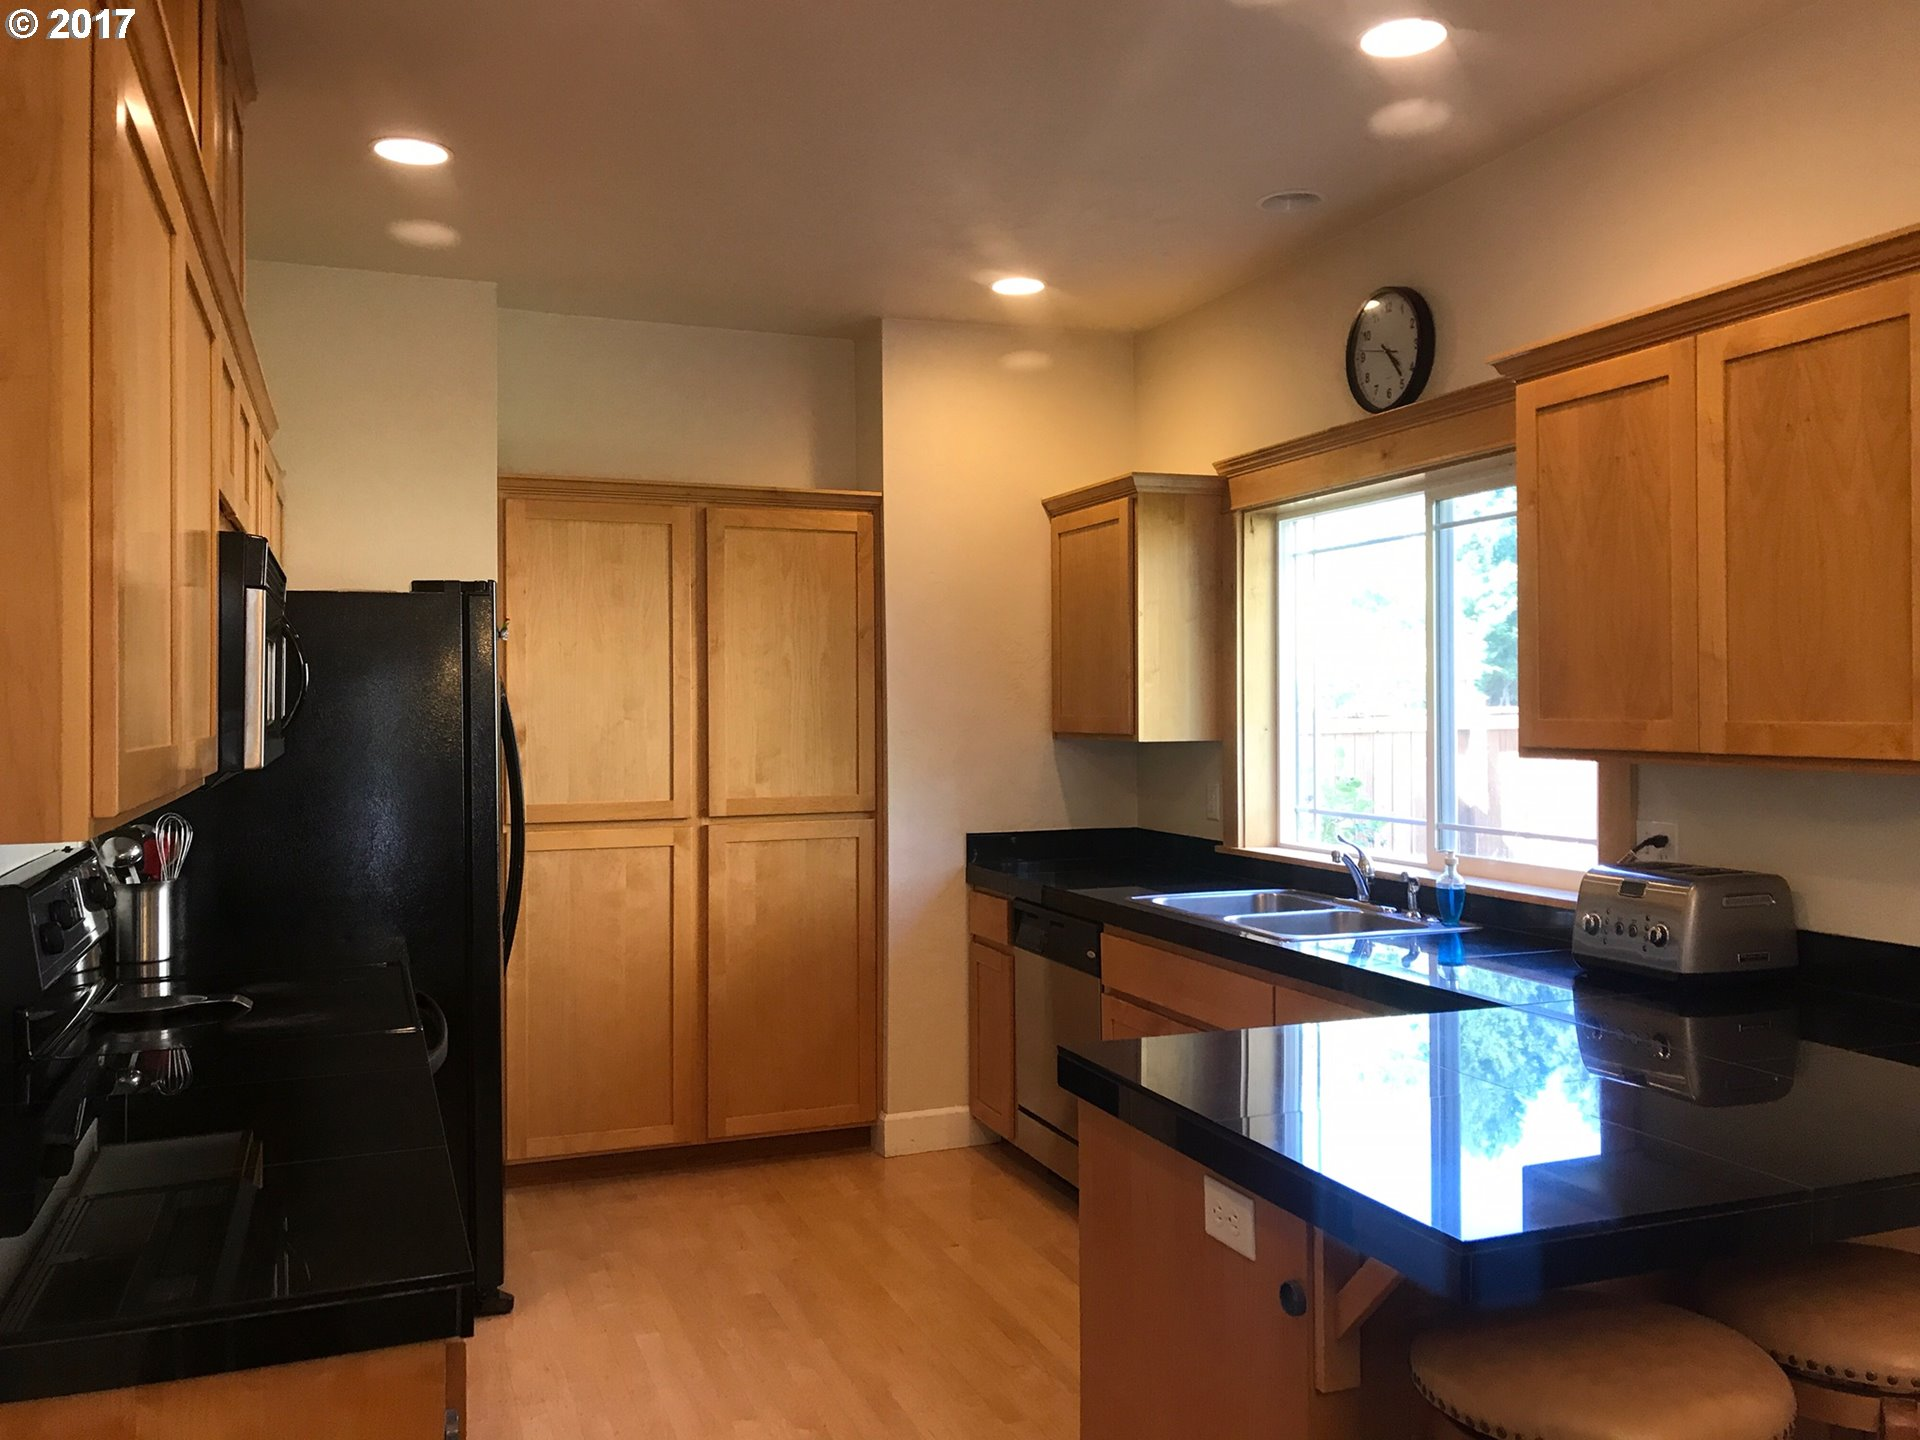 2216 sq. ft 3 bedrooms 2 bathrooms  House For Sale,Veneta, OR